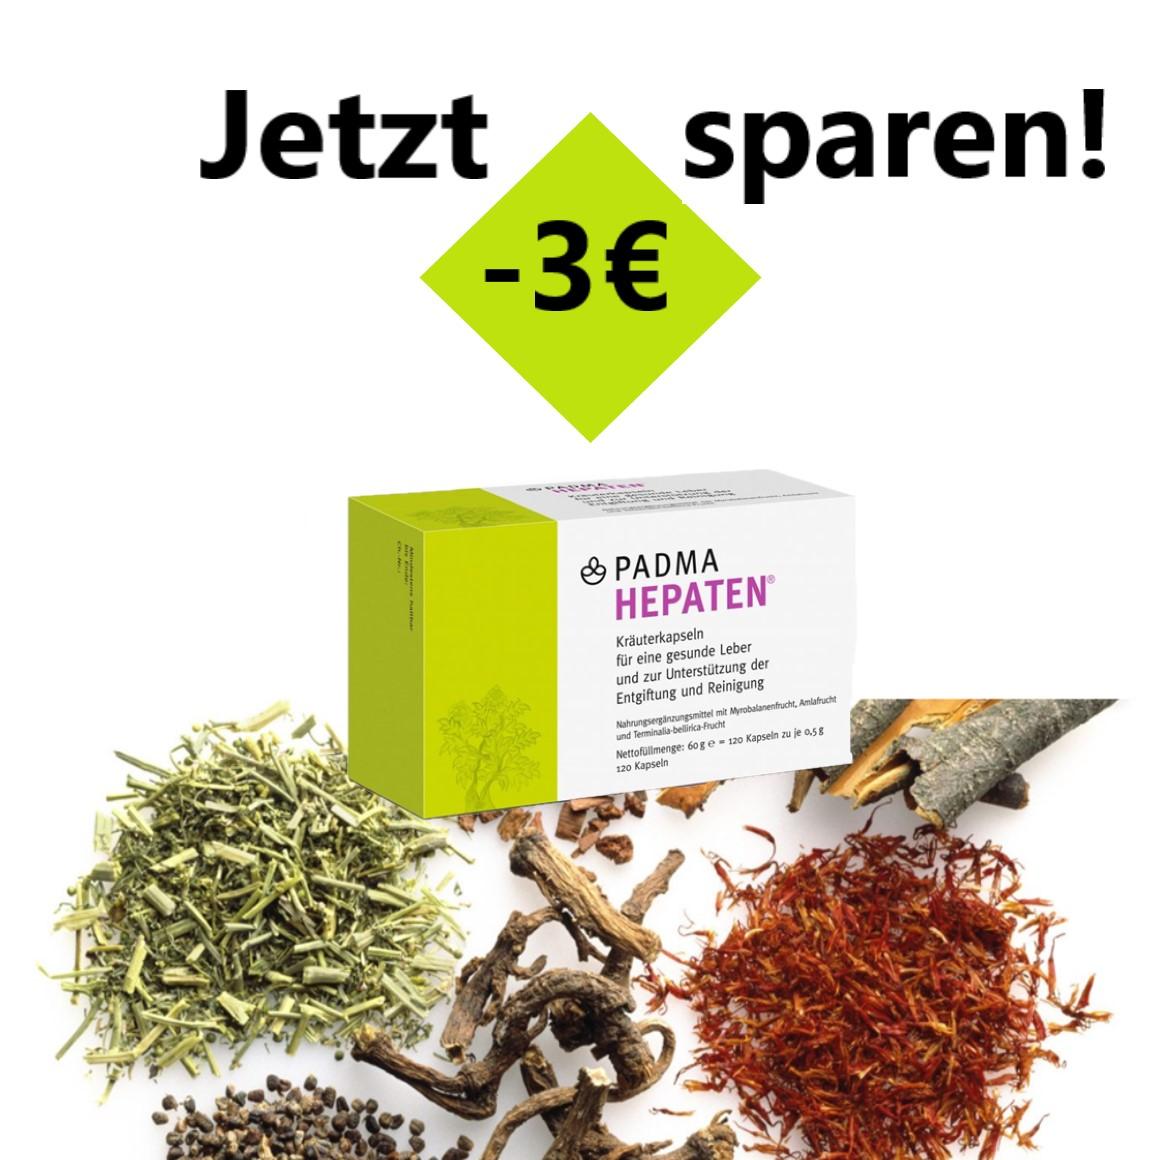 Padma Hepaten -3€ Frühjahrsaktion